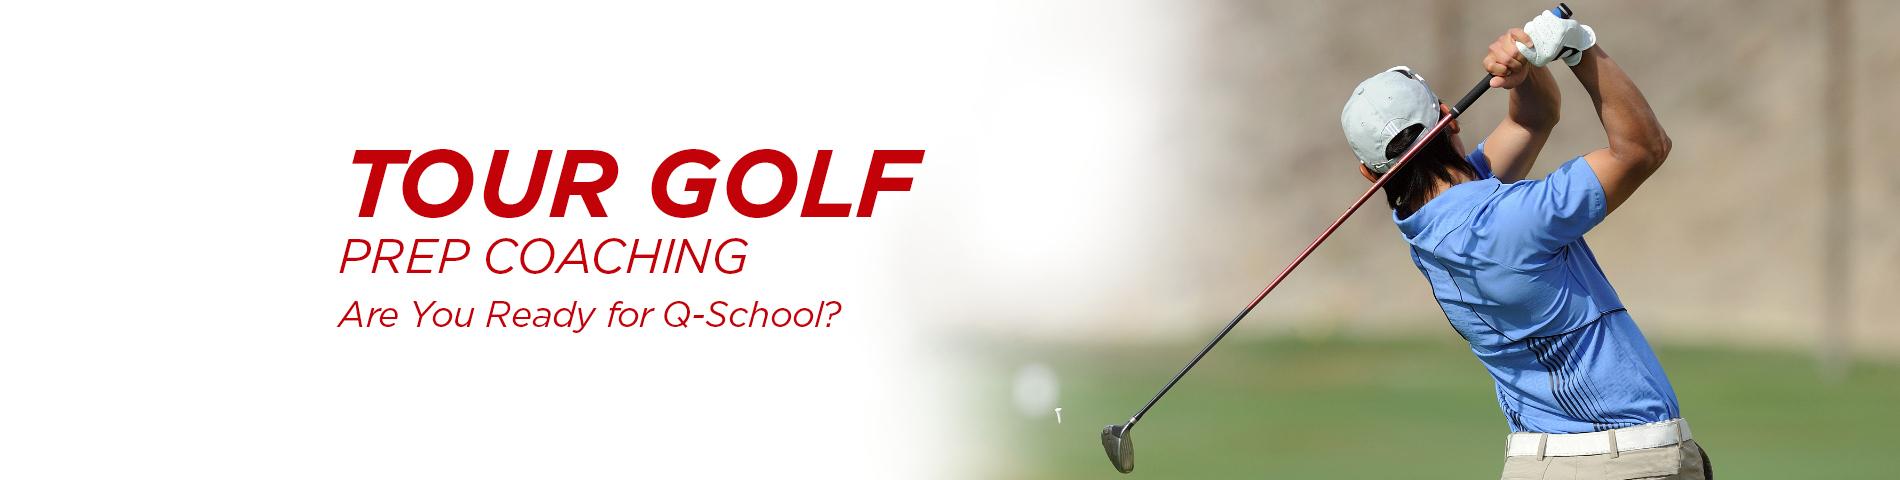 Tour Golf Prep